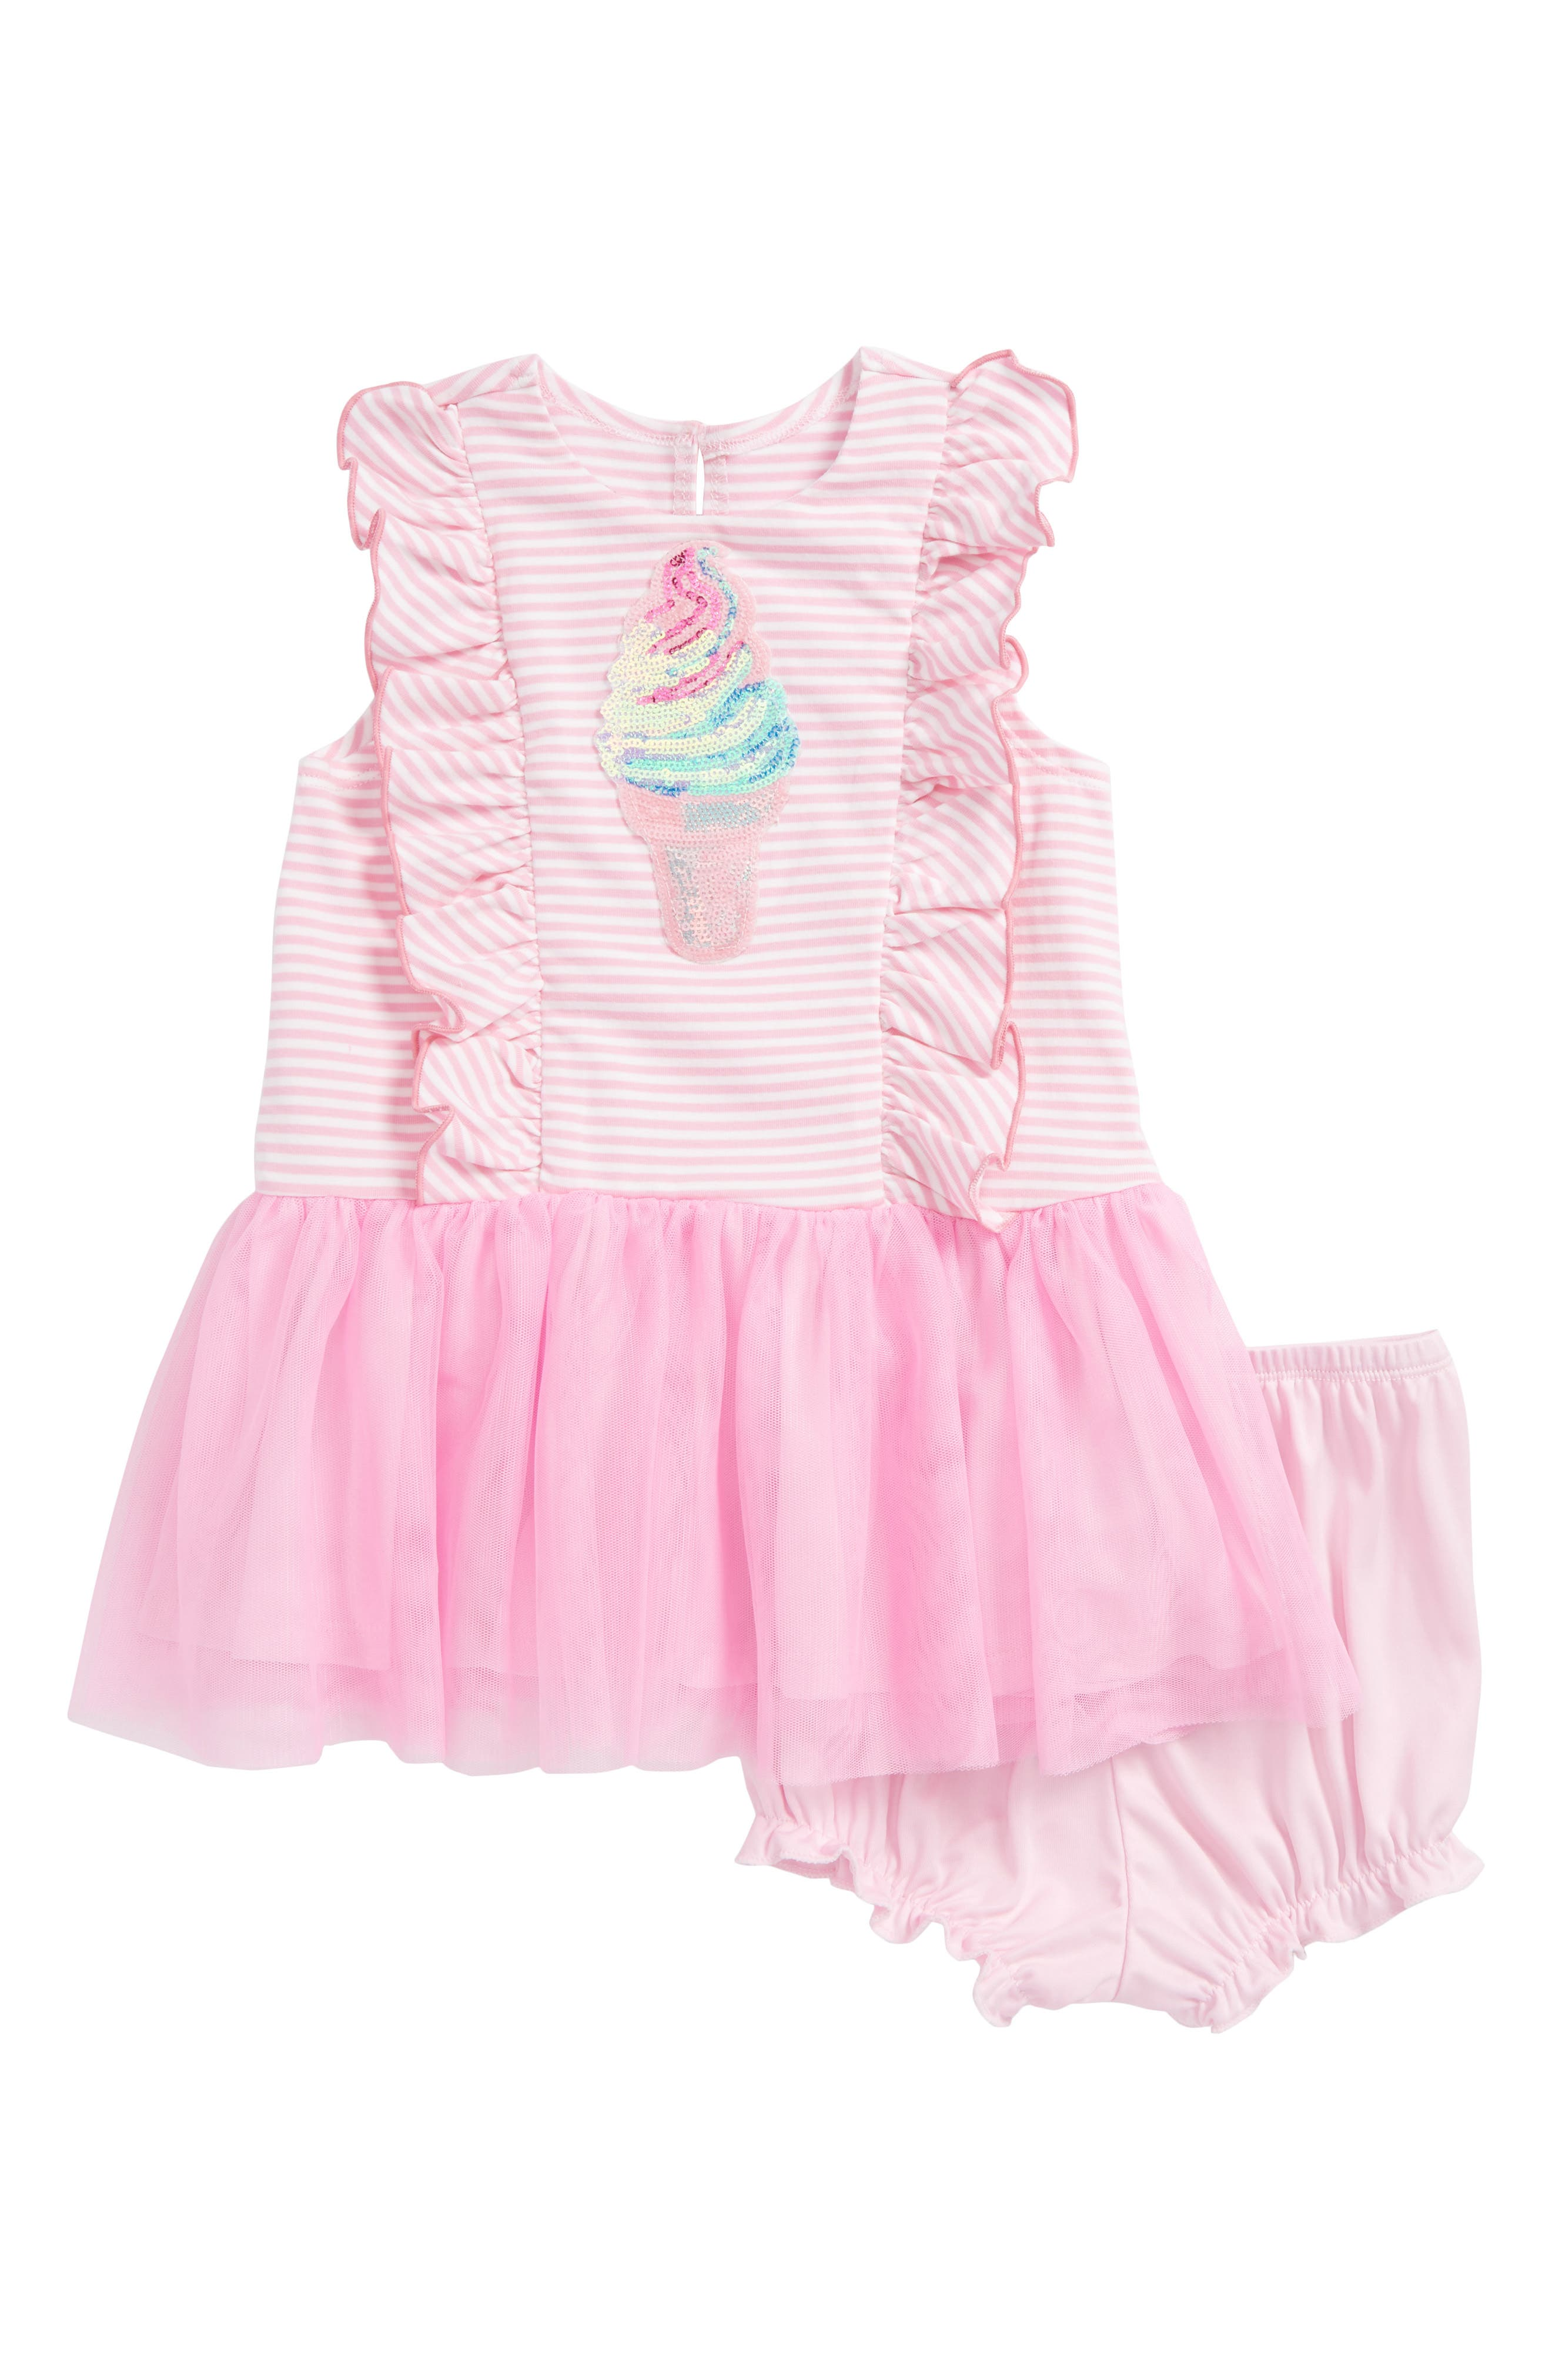 Ice Cream Cone Tutu Dress,                         Main,                         color, Pink/ White